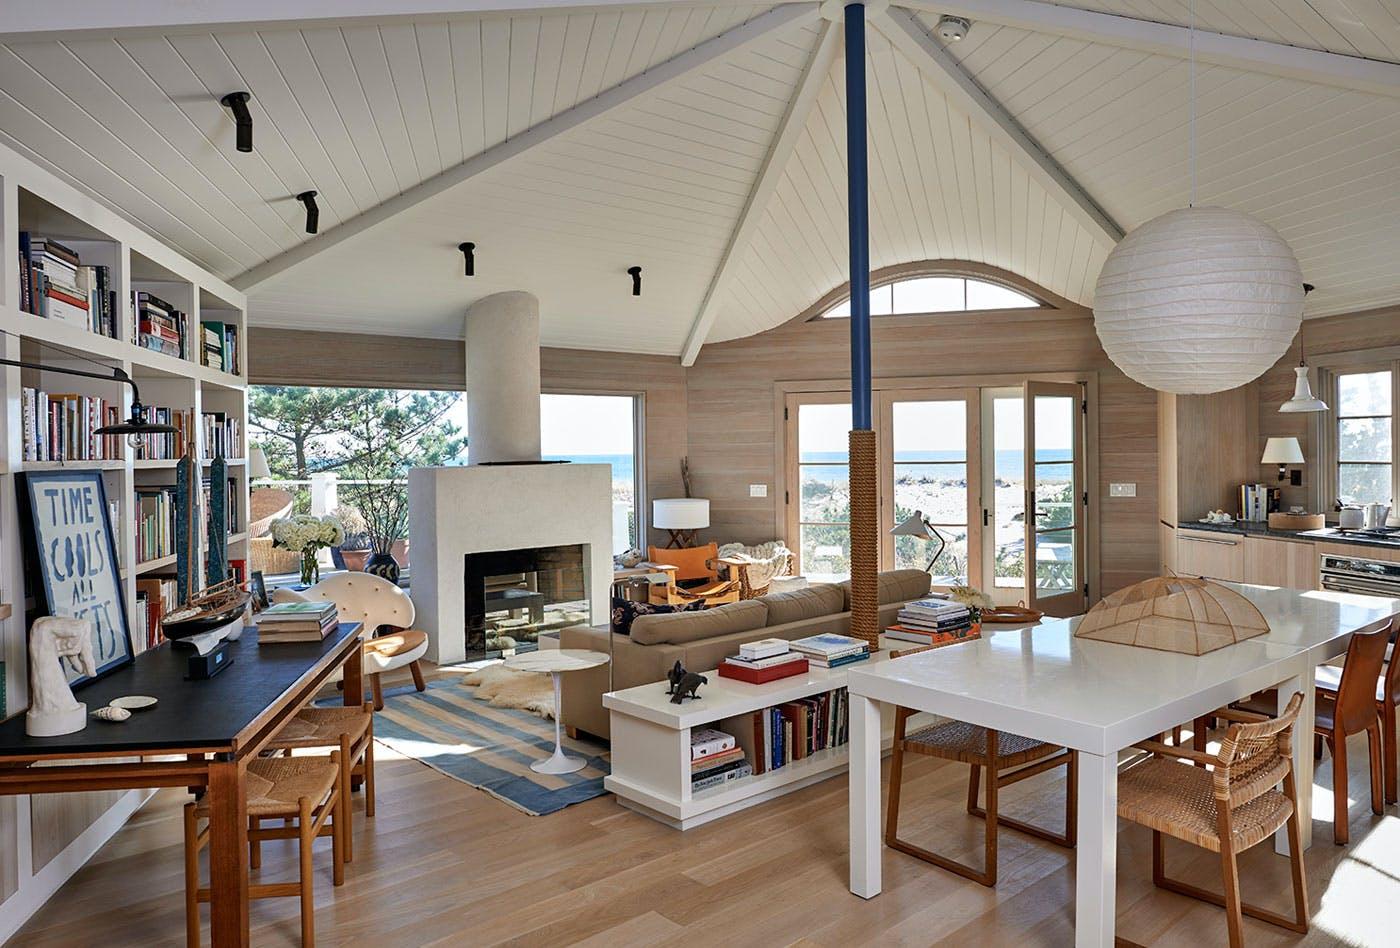 Amagansett beach house meyer davis studio archinect for Interior design staffing agency chicago